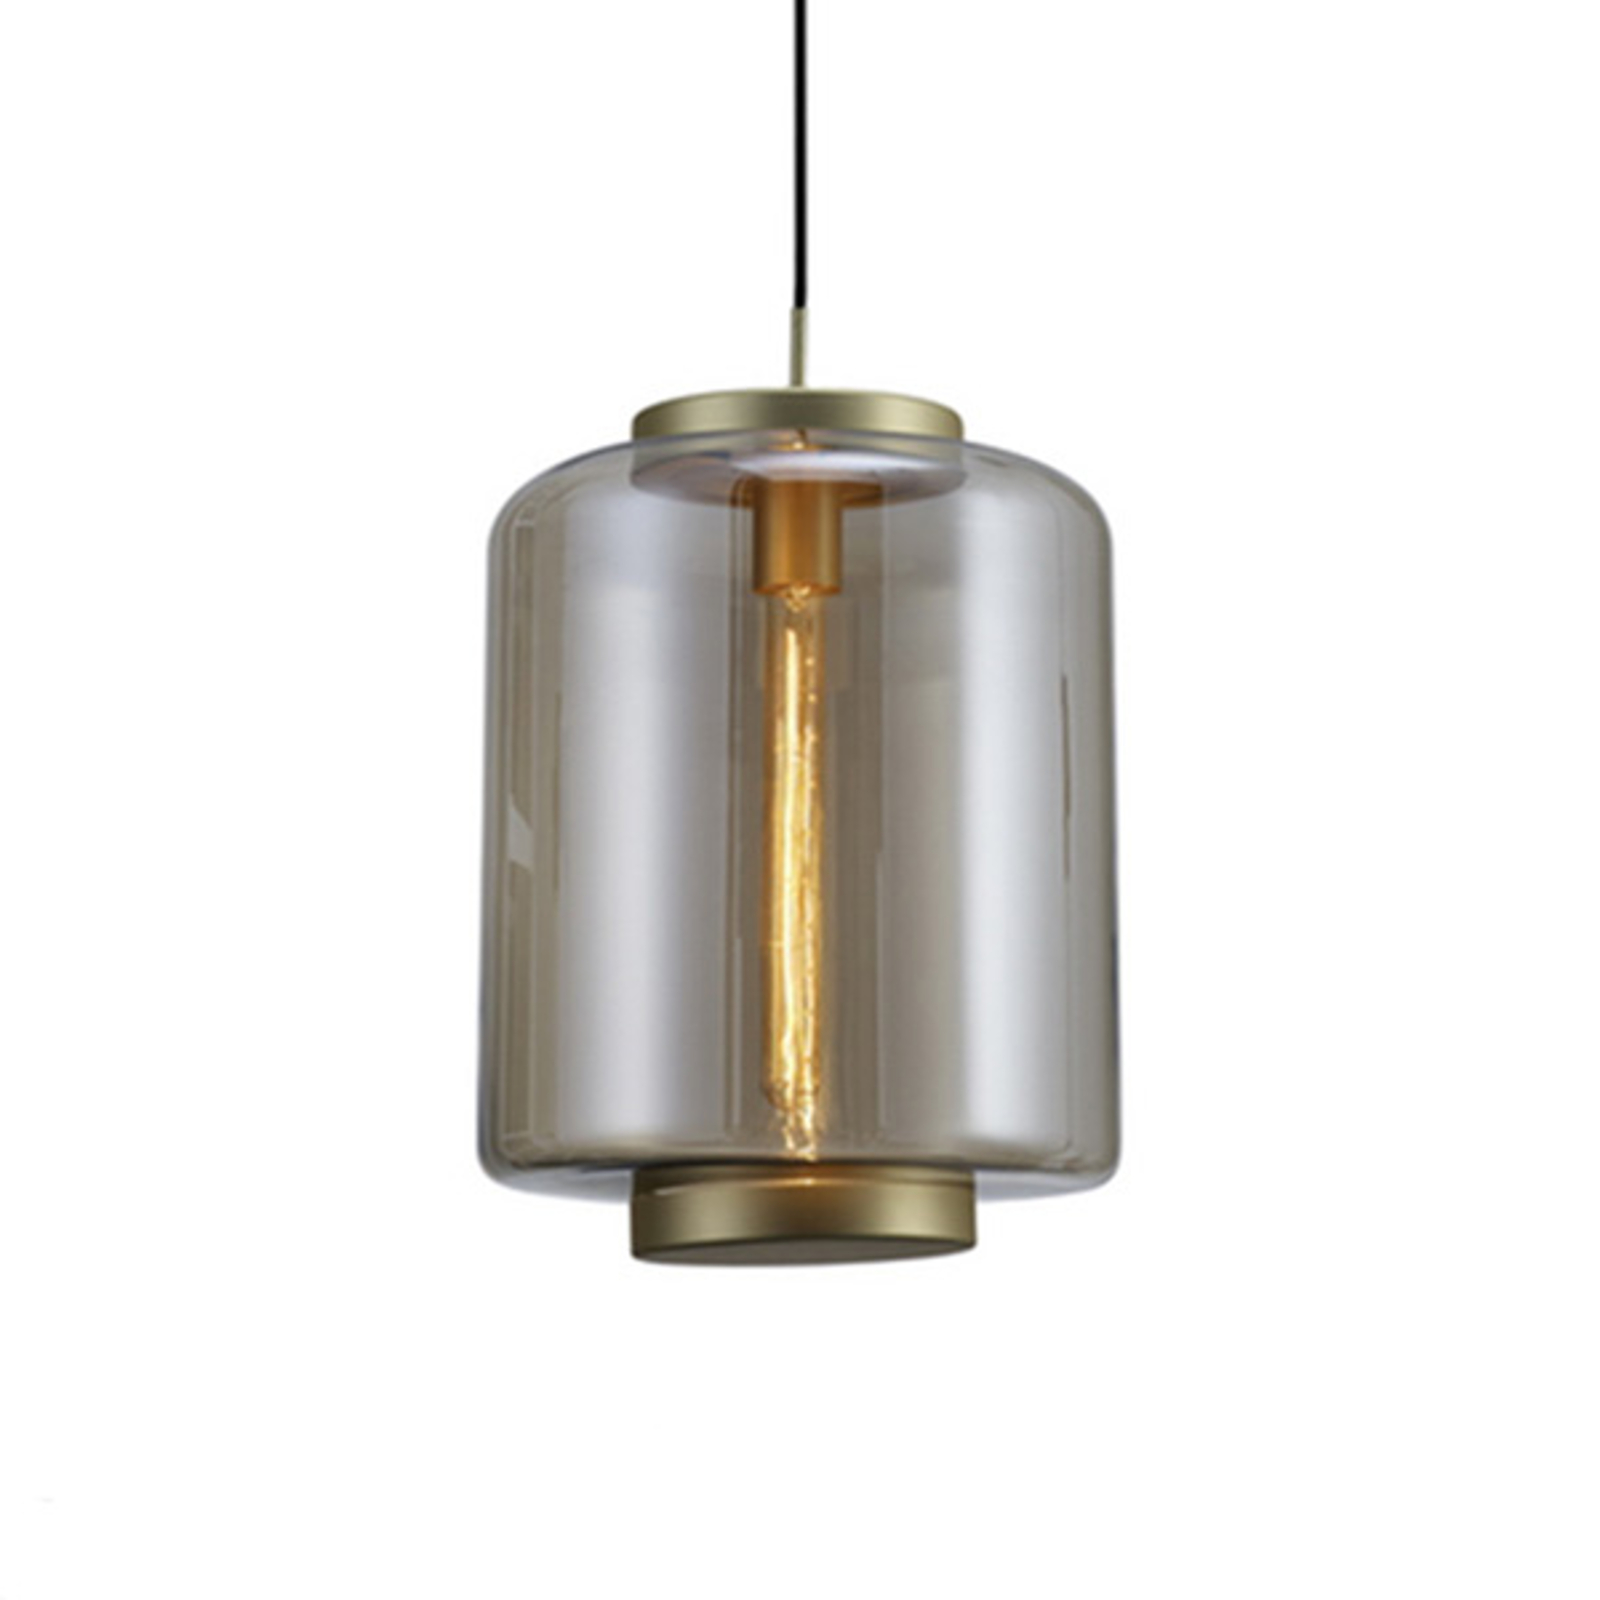 Hanglamp Jarras van glas Ø 30 cm, brons